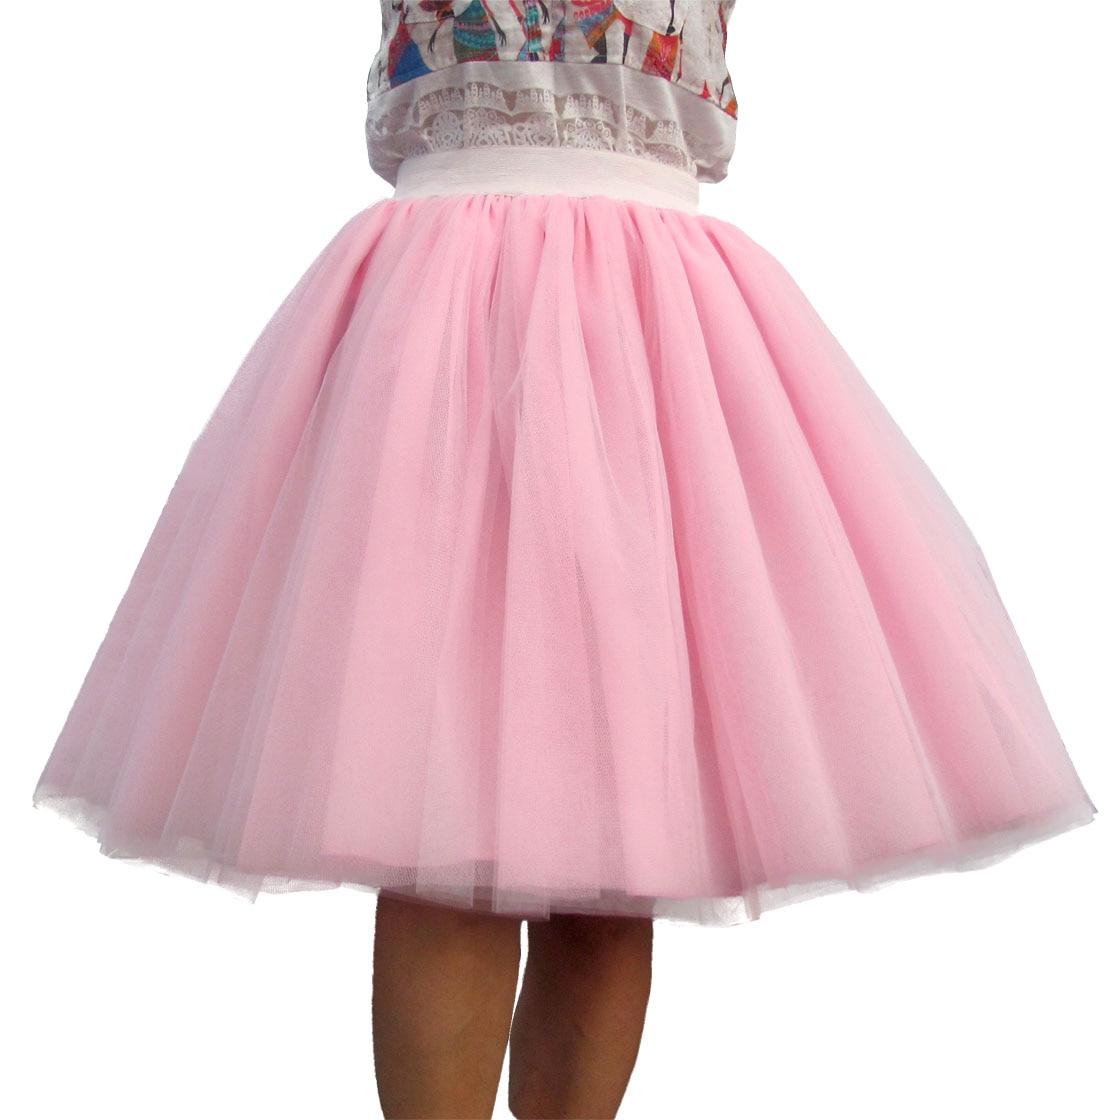 Maatwerk Dames Tule Rok 6 Laag van Wit Roze Zwart Baljurk Hoge taille falda Midi knielengte Plus Size Tutu rokken